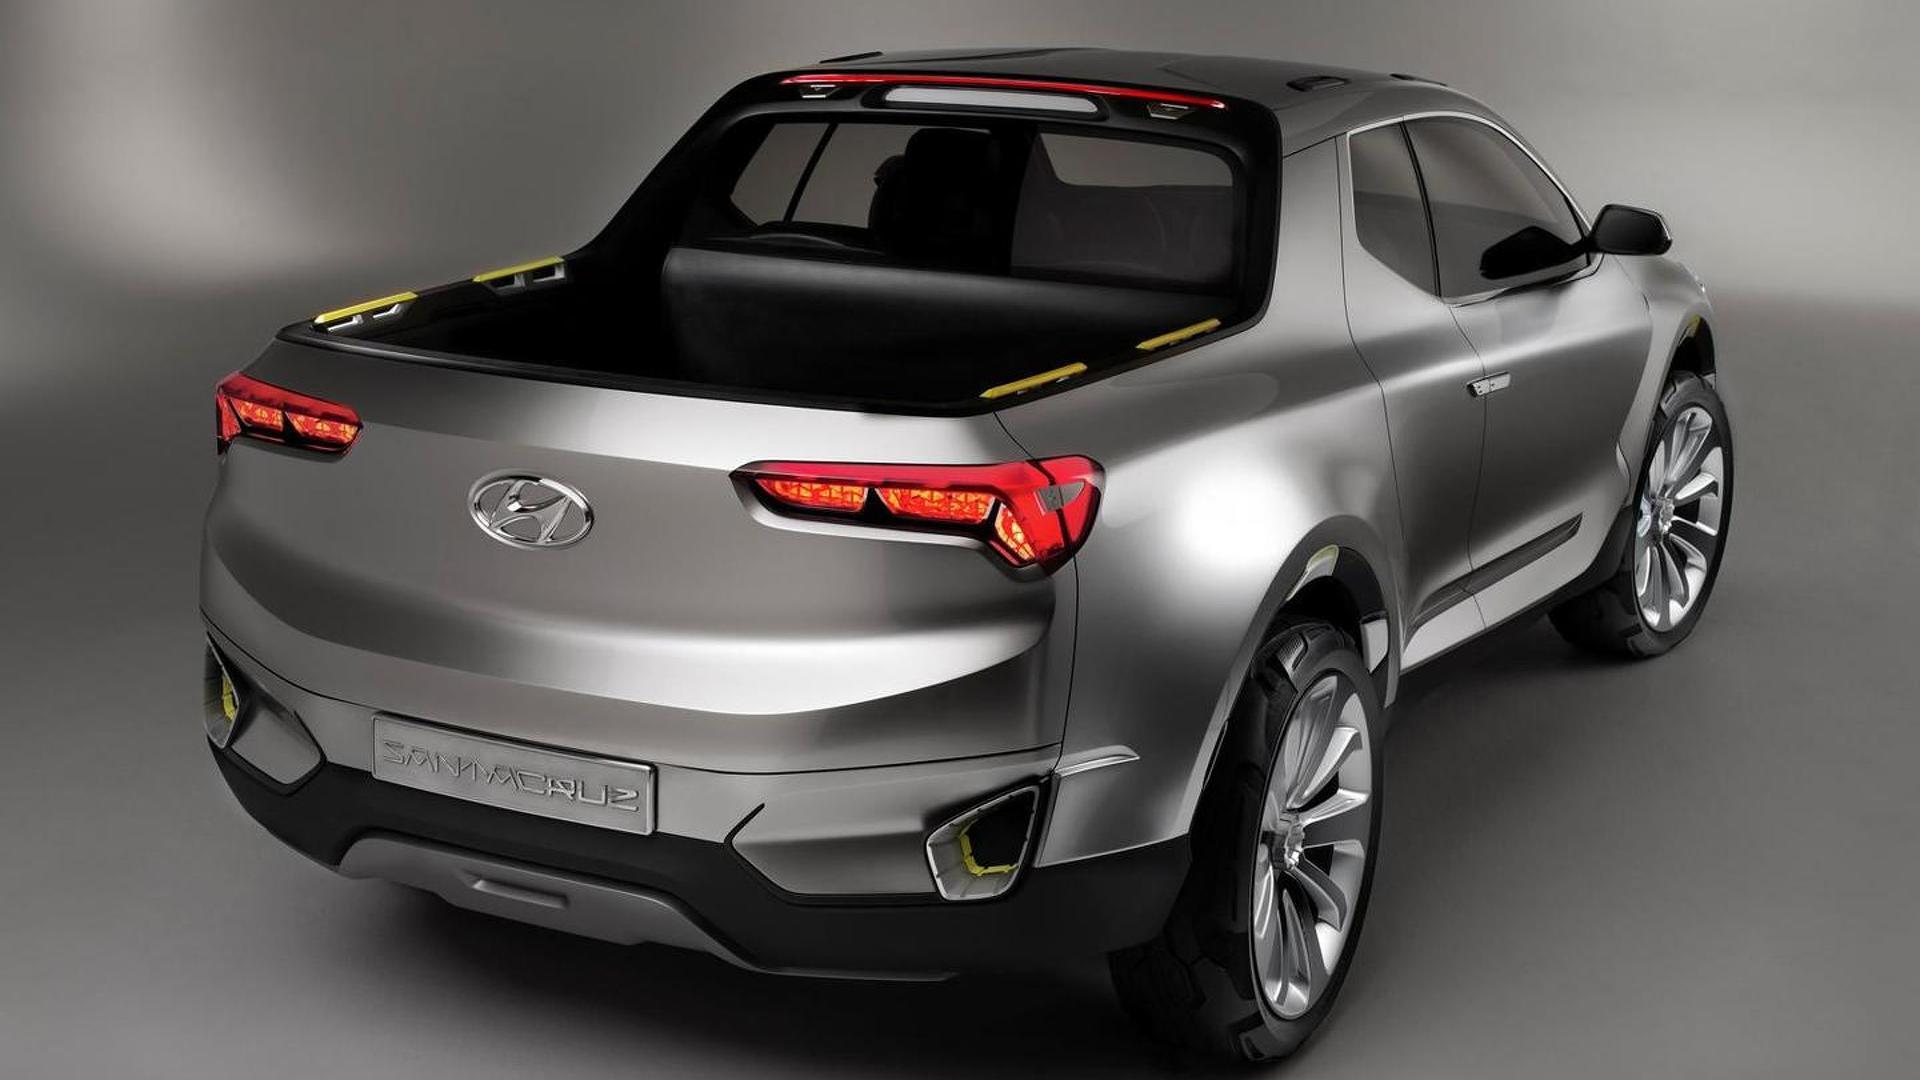 2020 Hyundai Santa Cruz Release Date, Price, Interior, Specs >> 2021 Hyundai Santa Cruz Render Proposes Stylish Pickup Truck